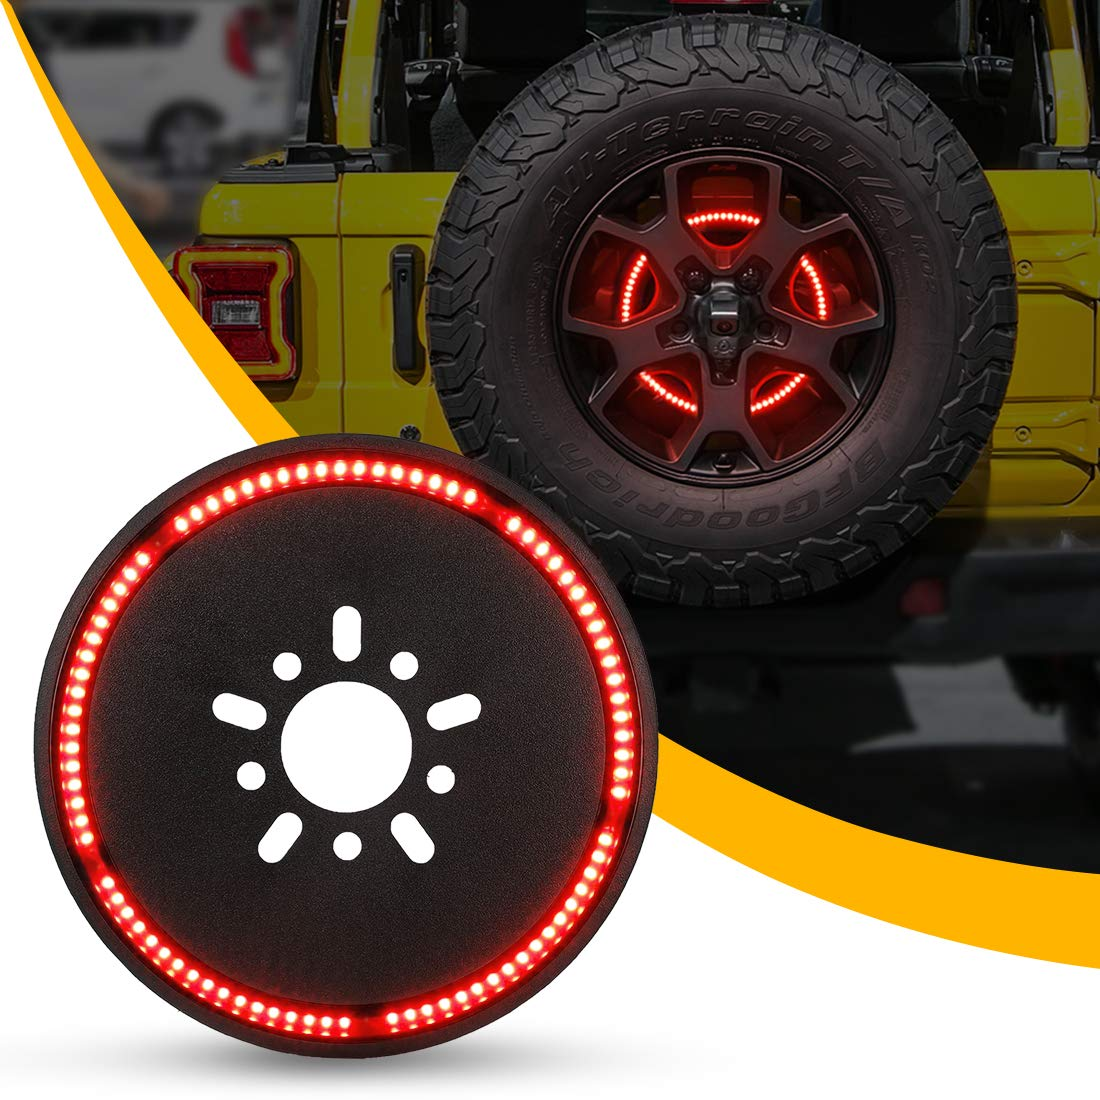 Spare Tire Brake Light Wheel Light 3rd Third Brake Light for 2018 2019 Jeep Wrangler JL JLU with Back Up Camera